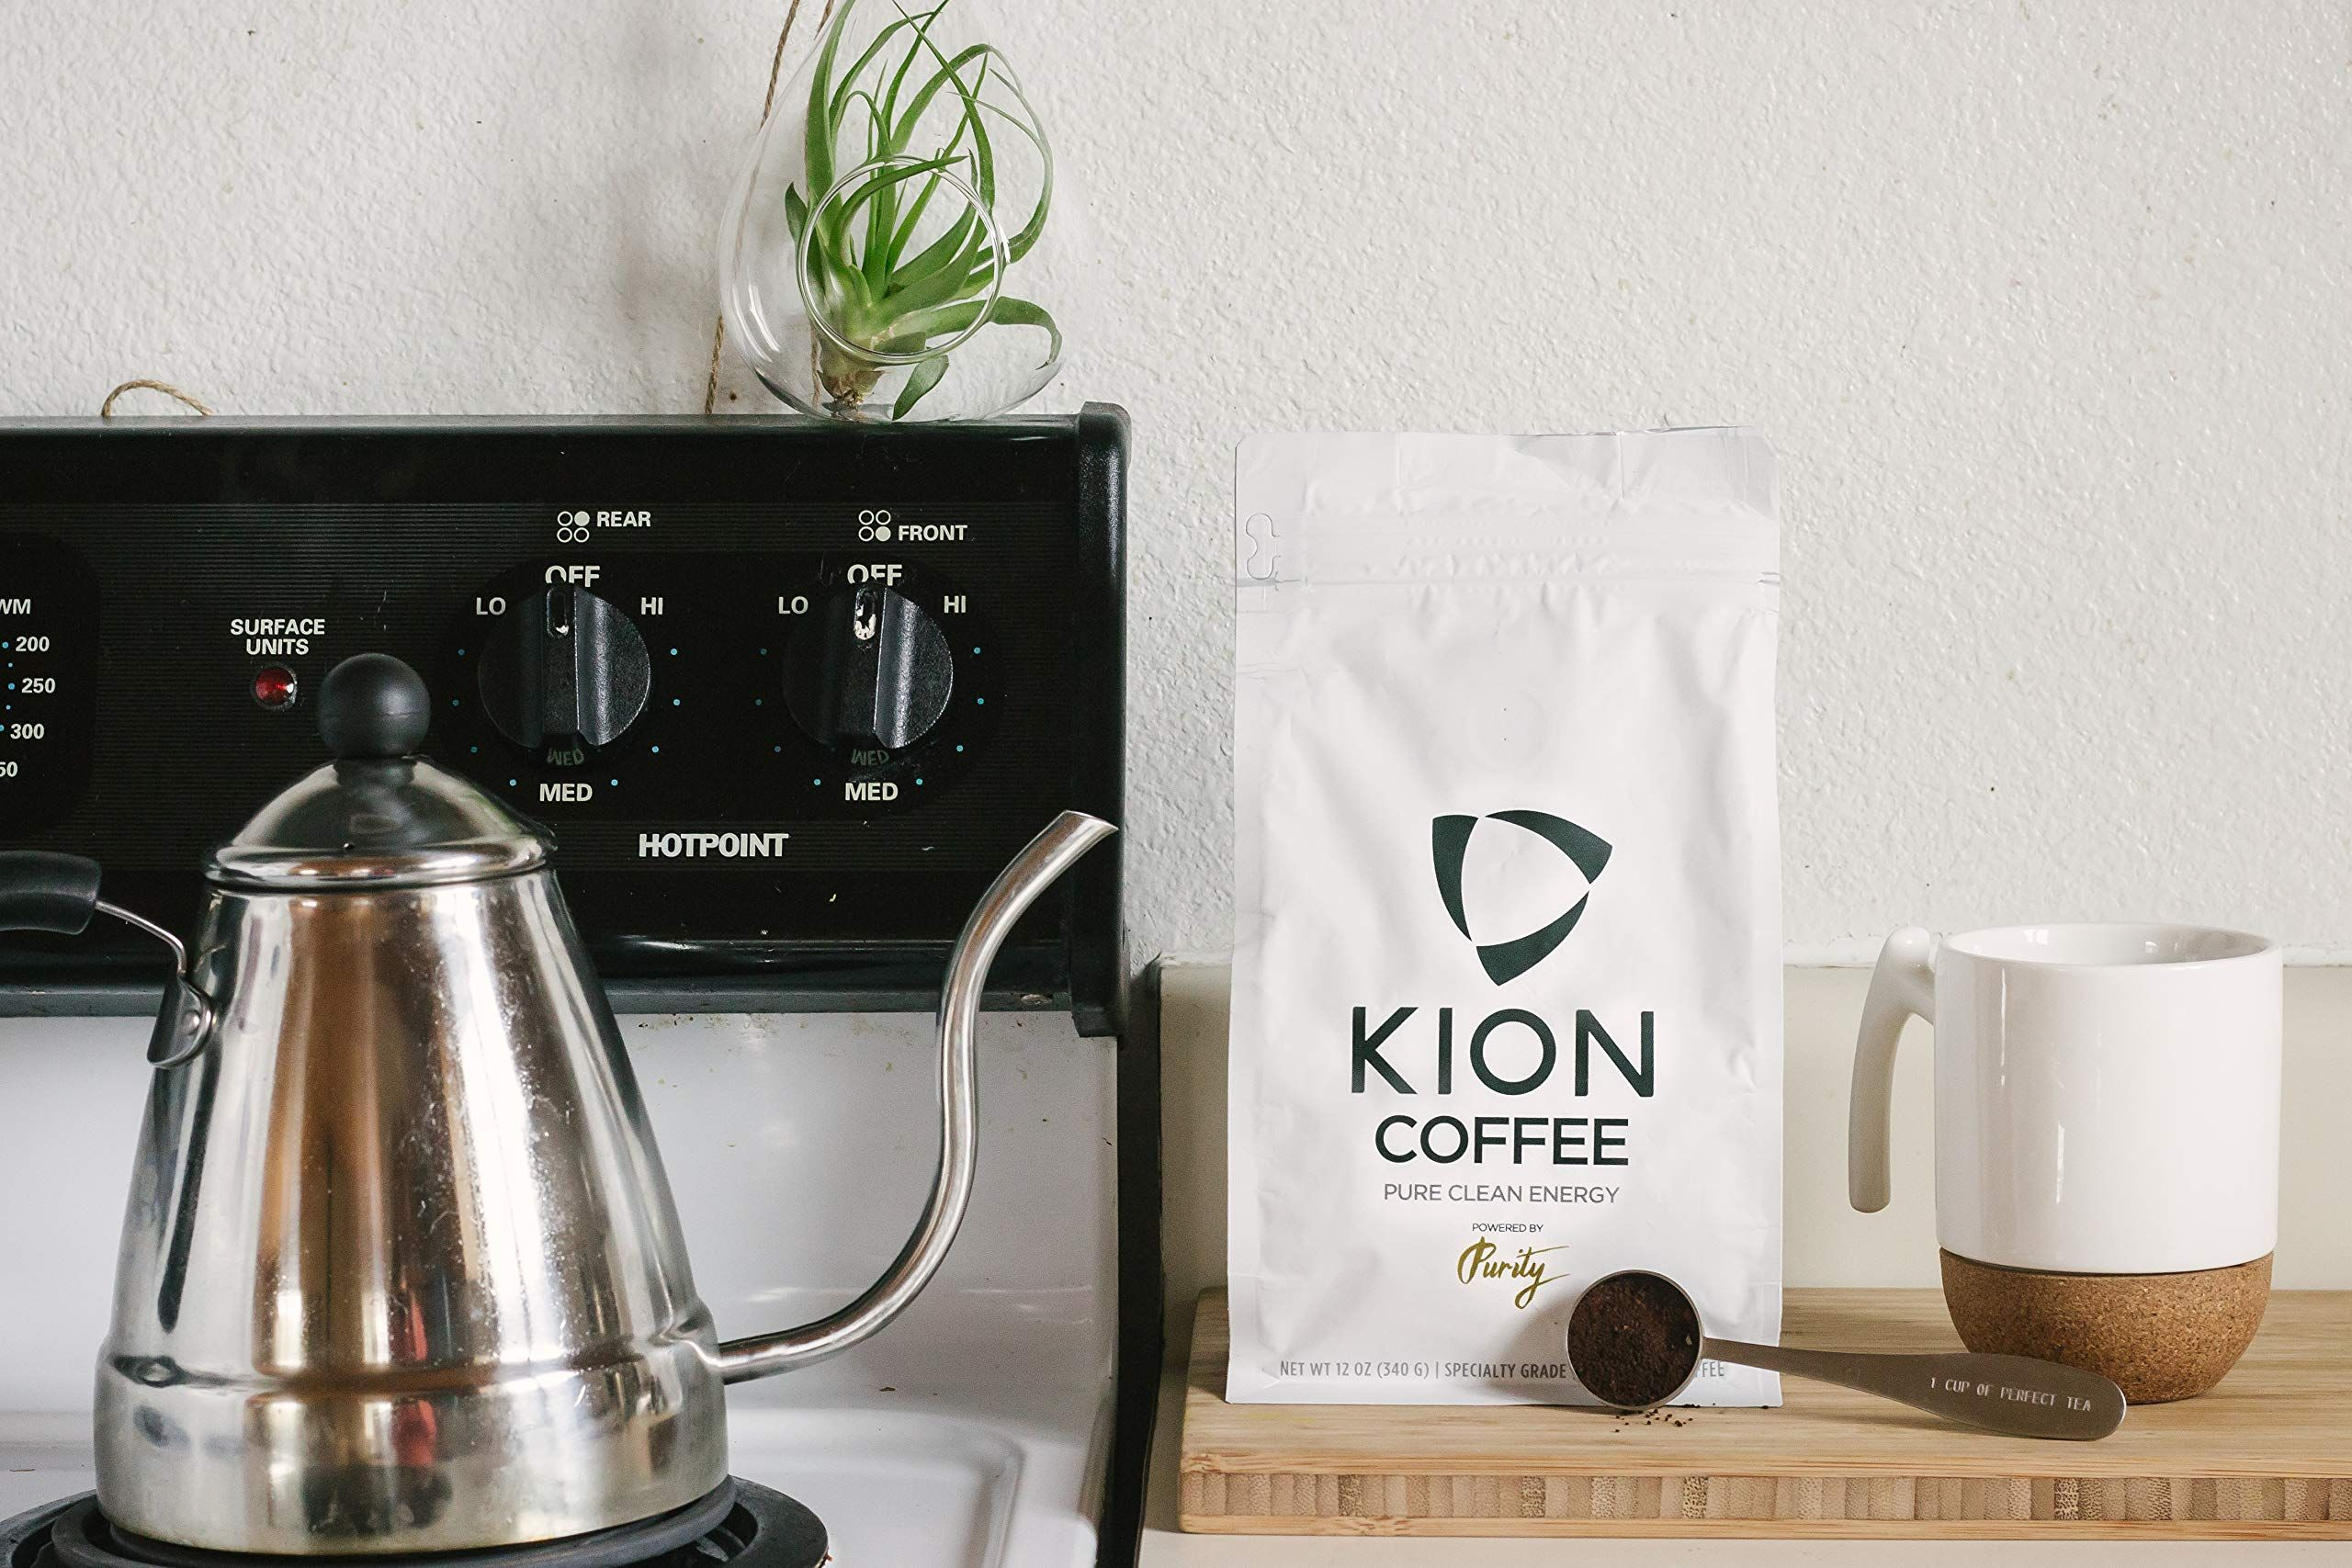 Kion organic whole bean coffee designed for taste purity